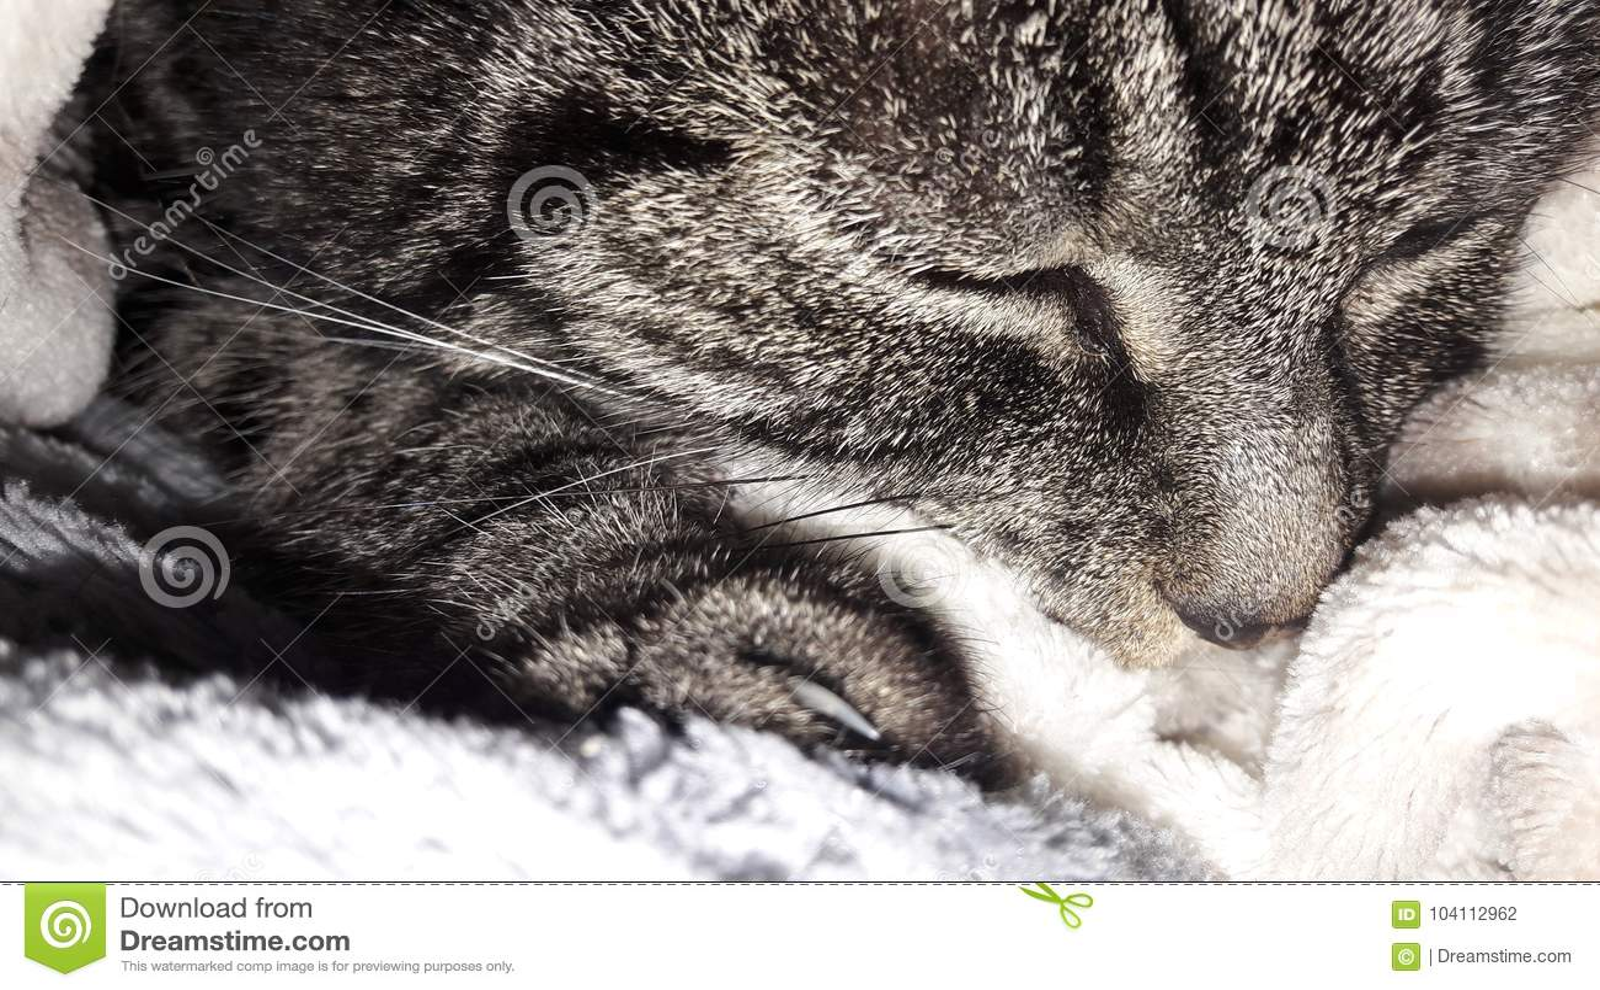 Katten smyga sig i ull